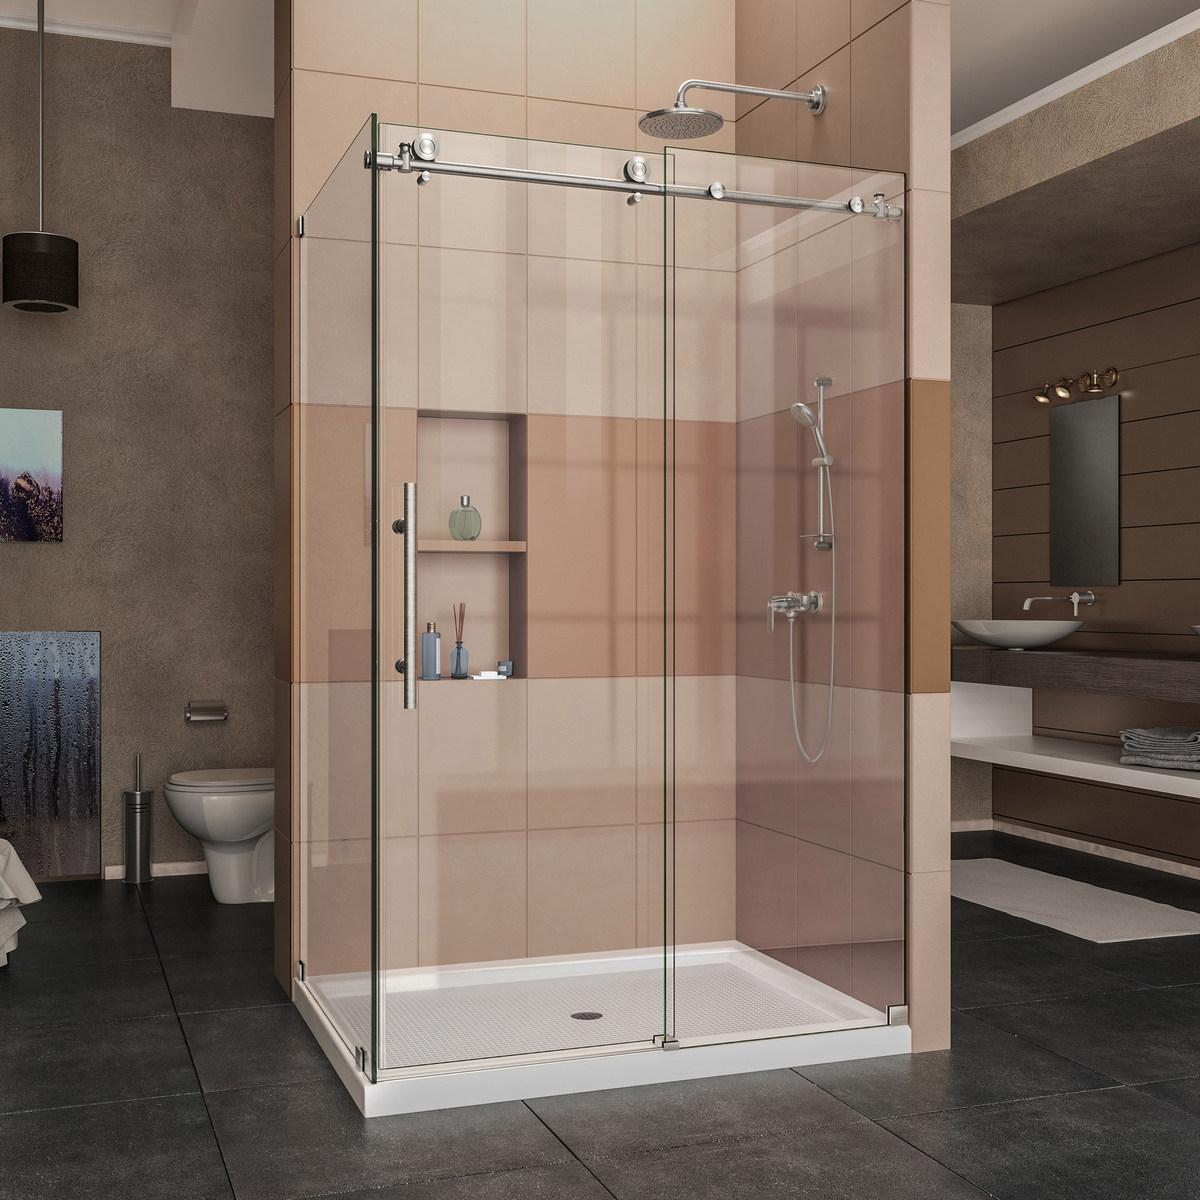 Dreamline Enigma Fully Frameless Sliding Shower Enclosure Brushed